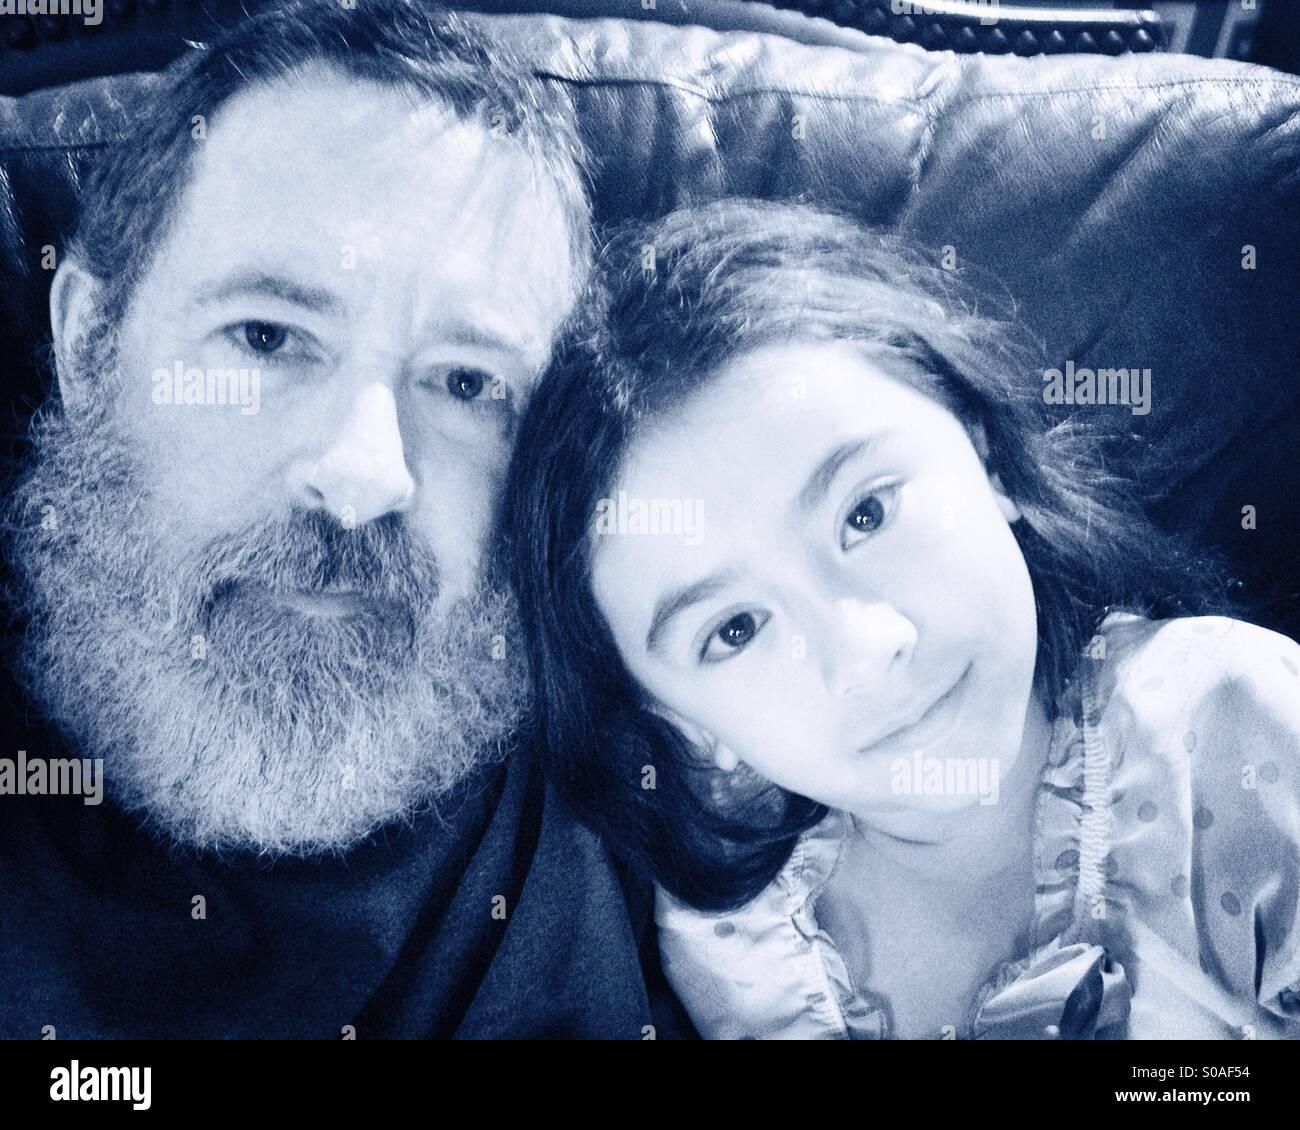 Vater und Tochter Selfie. Stockbild